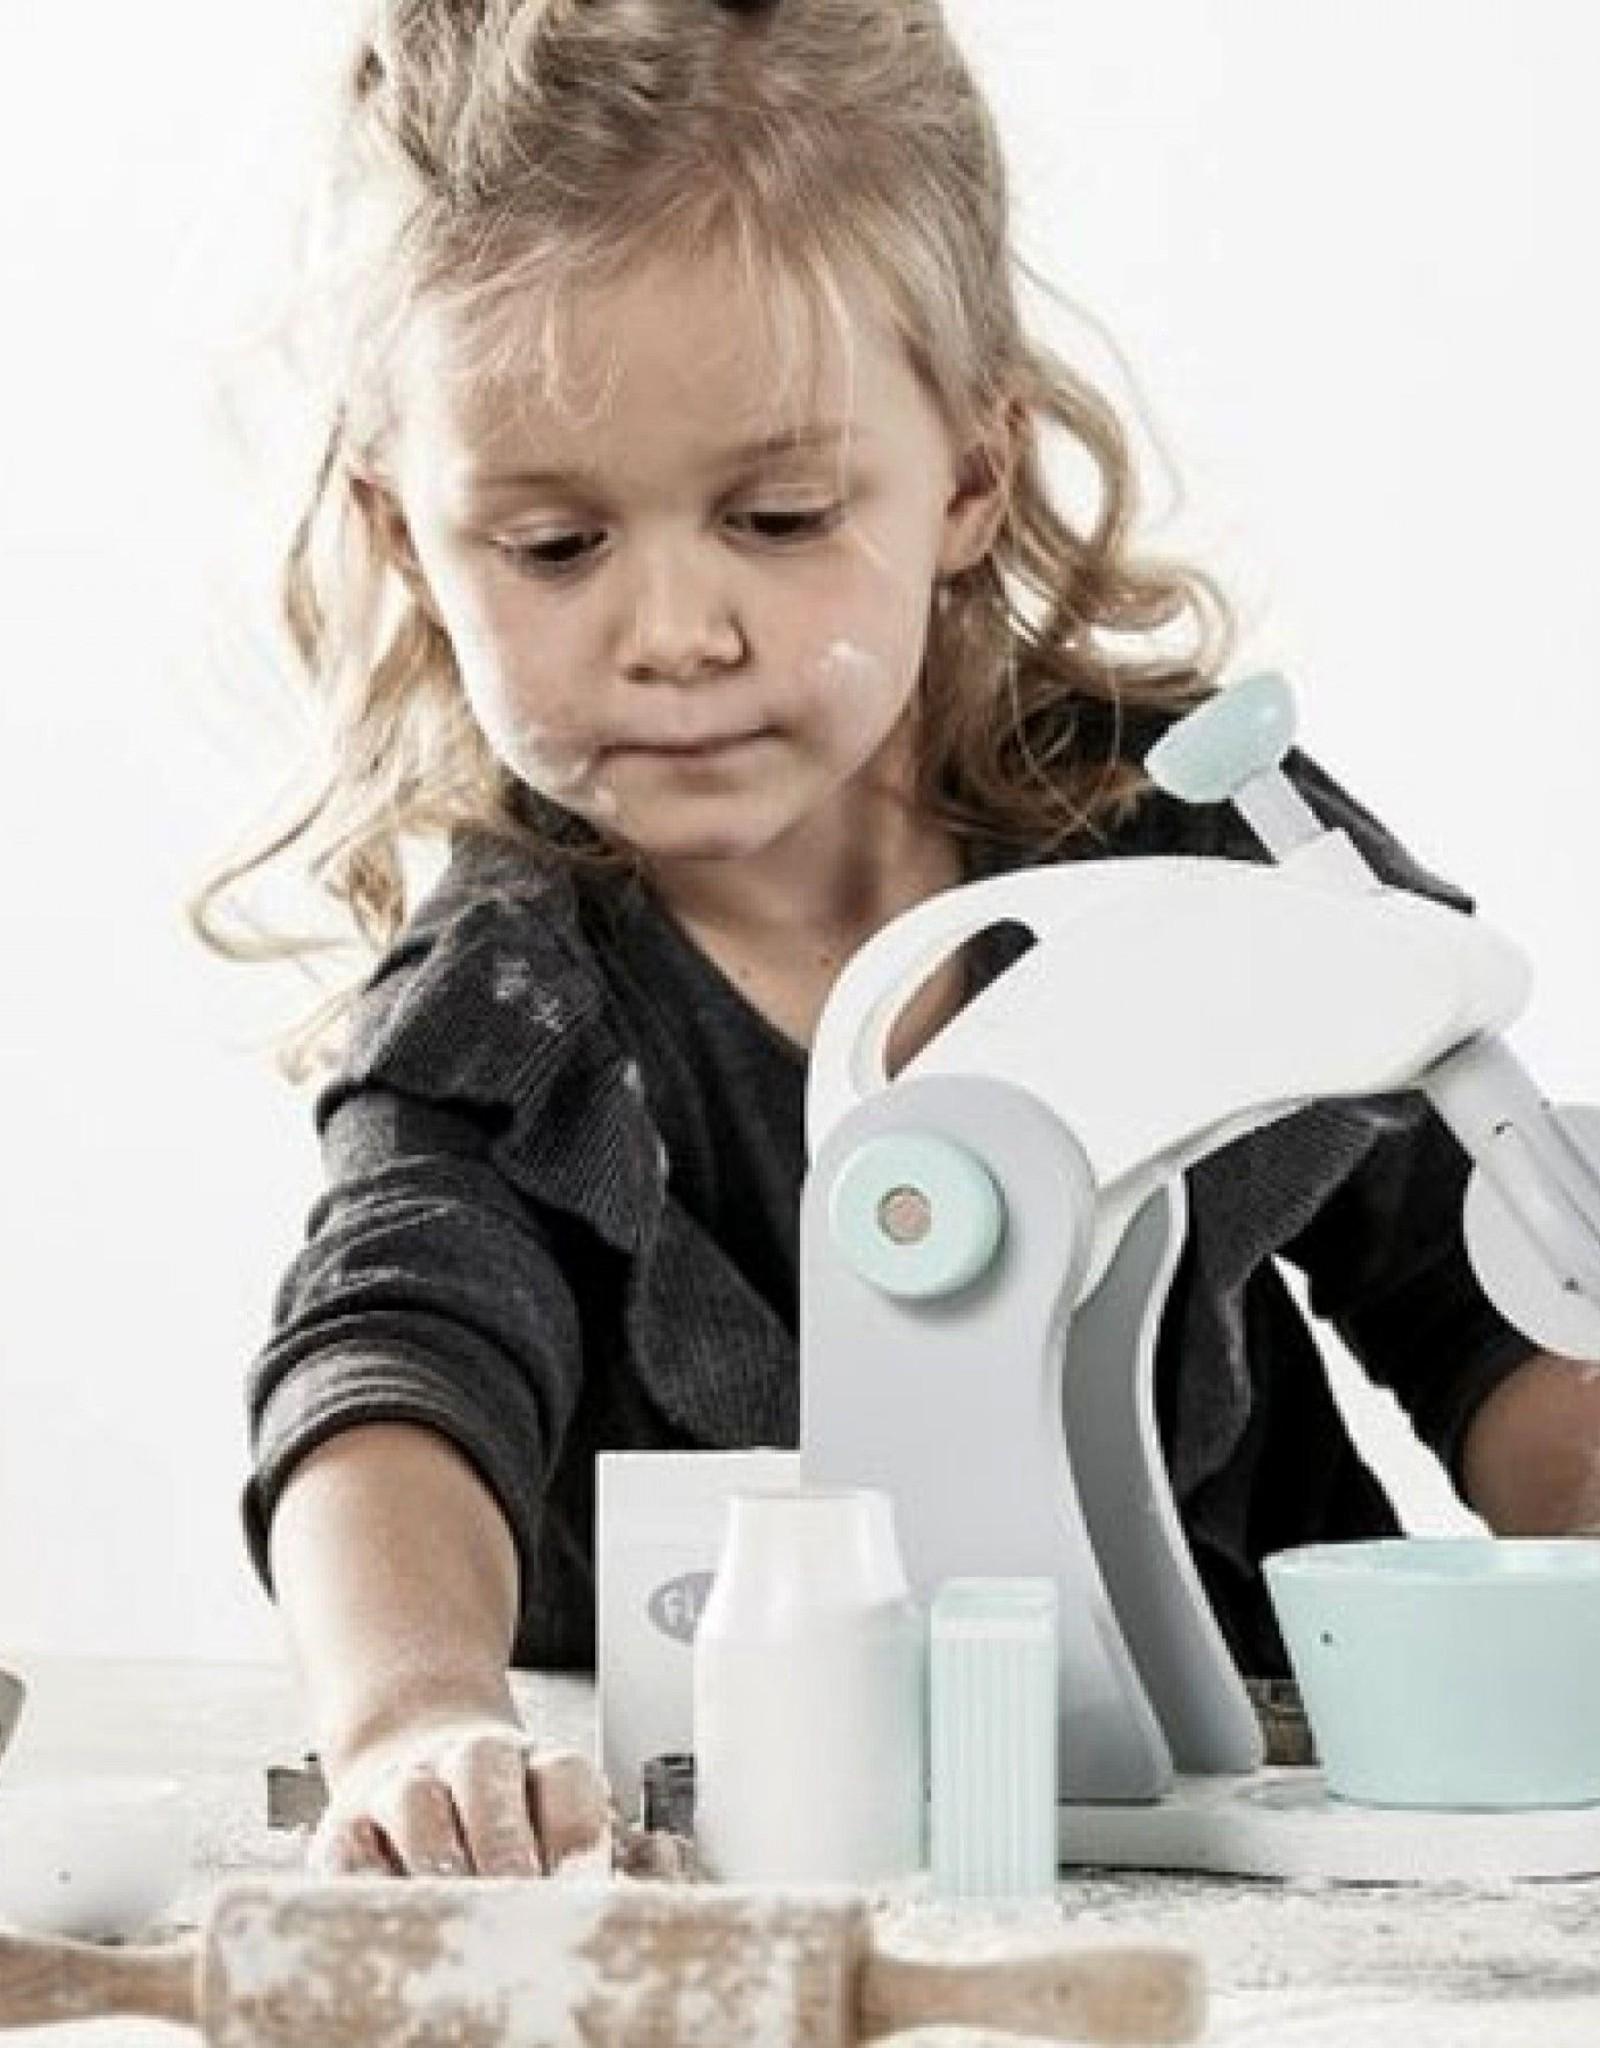 Kid's Concept Kid's Concept - MIXER